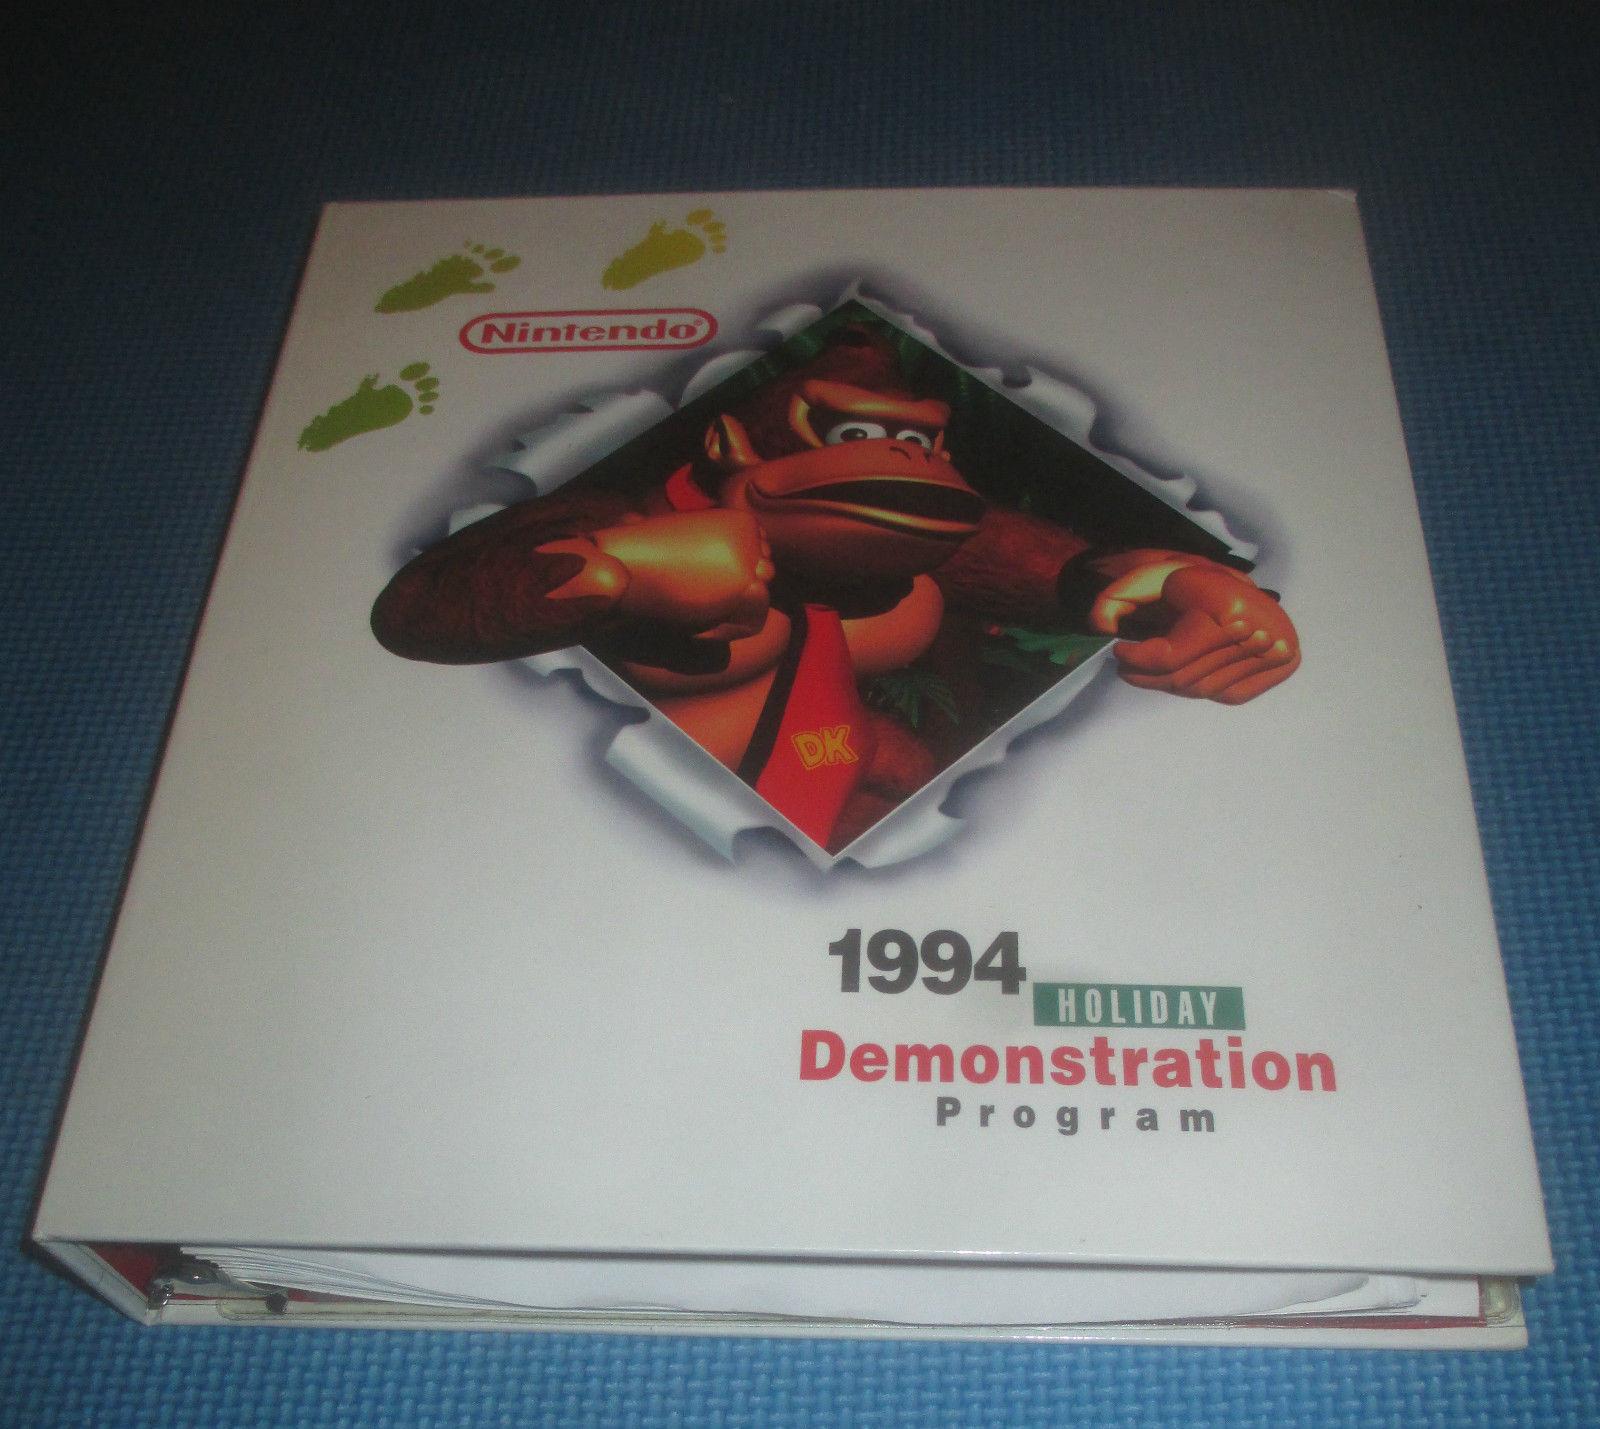 1994 Holiday Demonstration Program